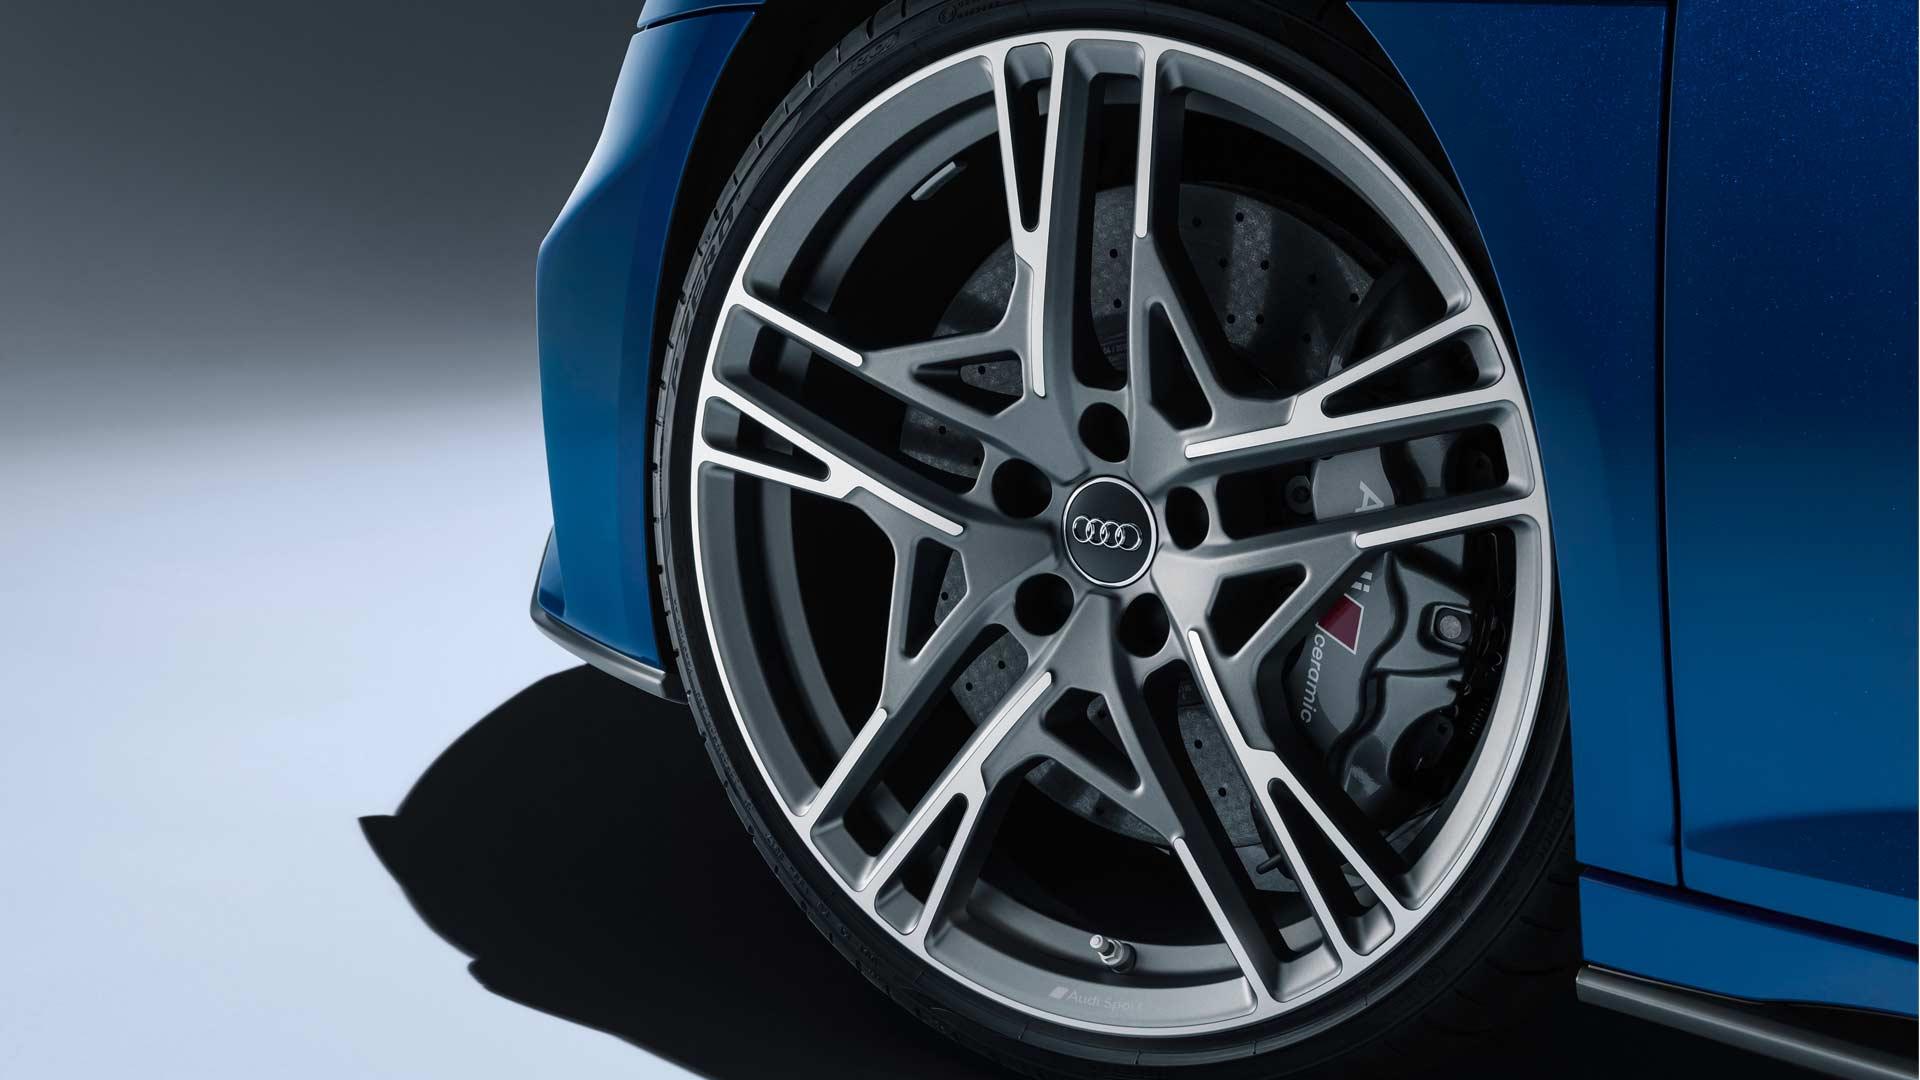 2019-Audi-R8-wheels